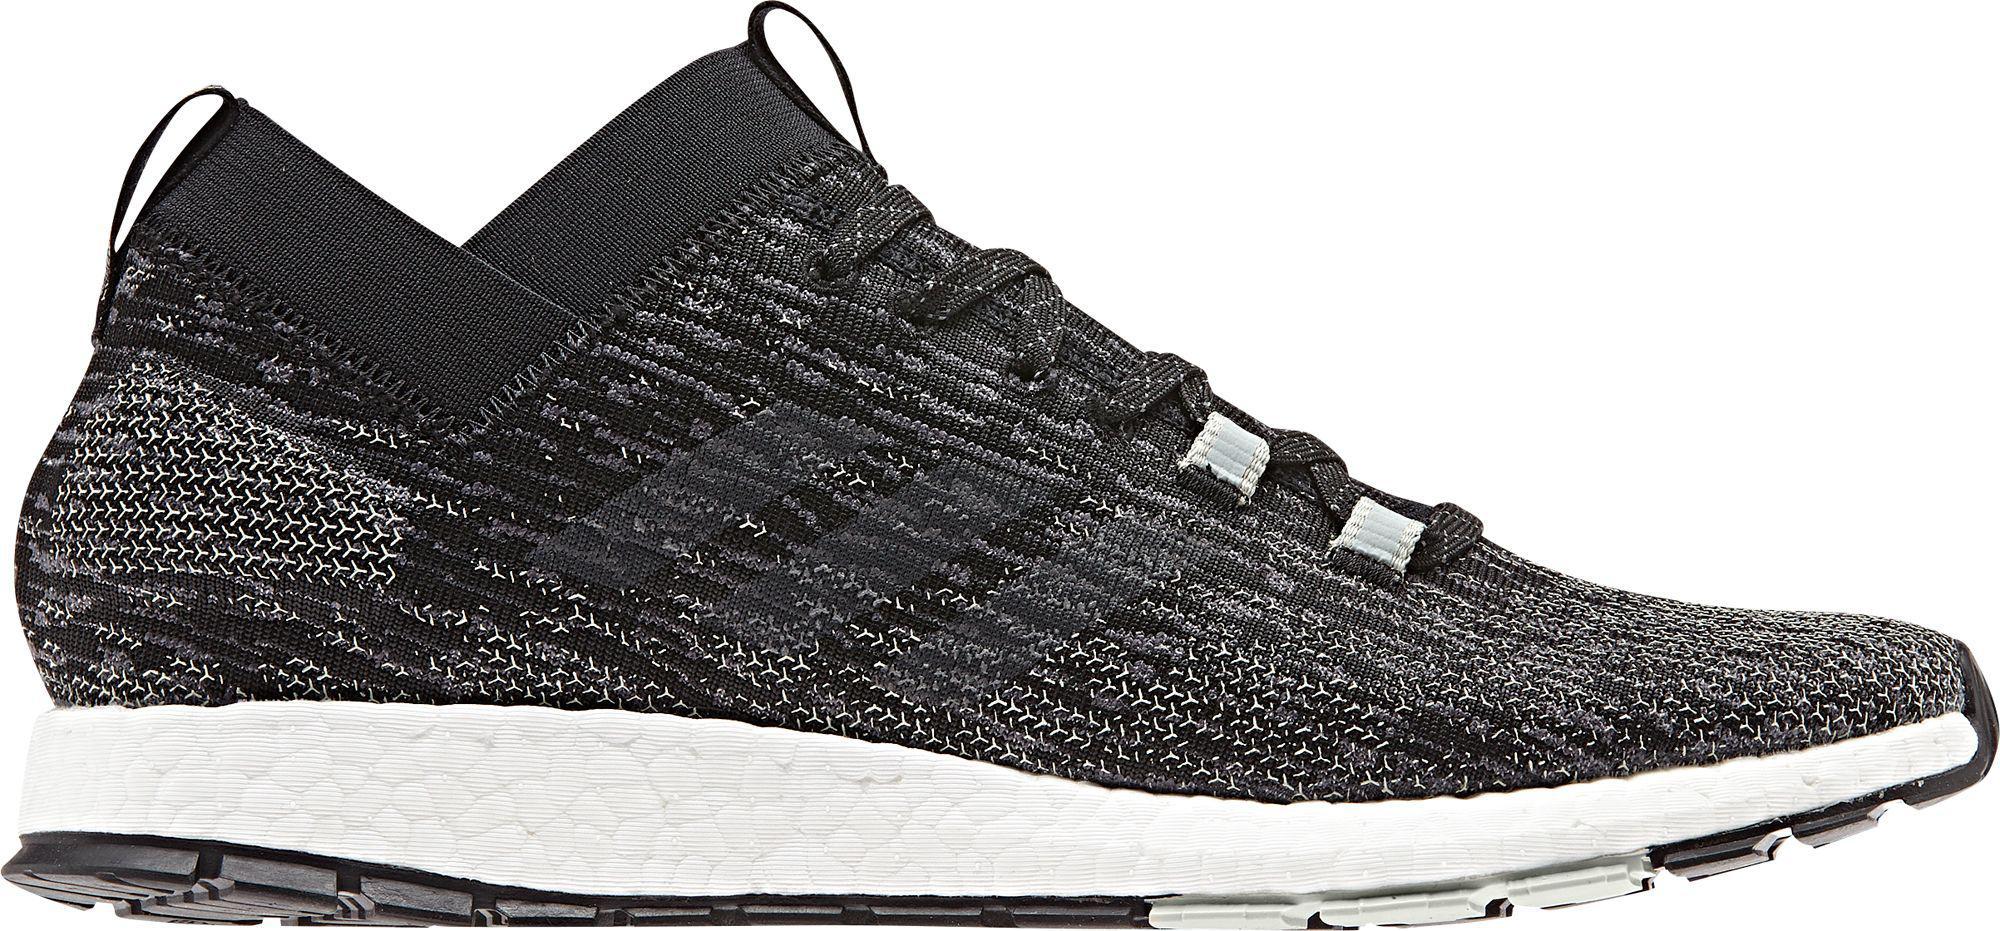 adidas Pureboost Rbl Ltd Running Shoes